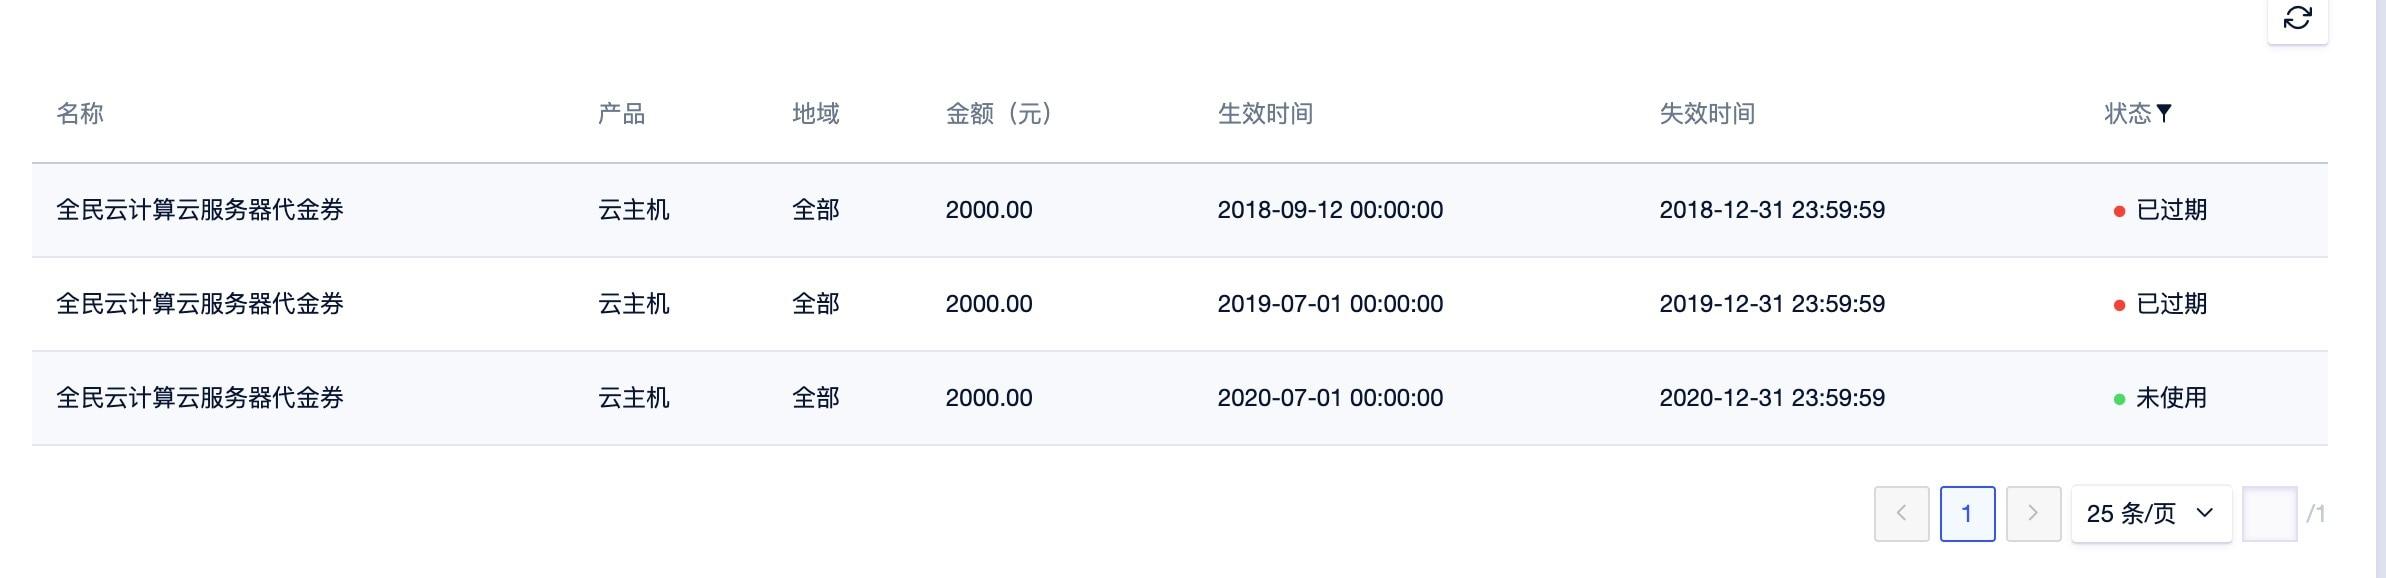 【UCloud】这两千代金券怎么用?-天际部落